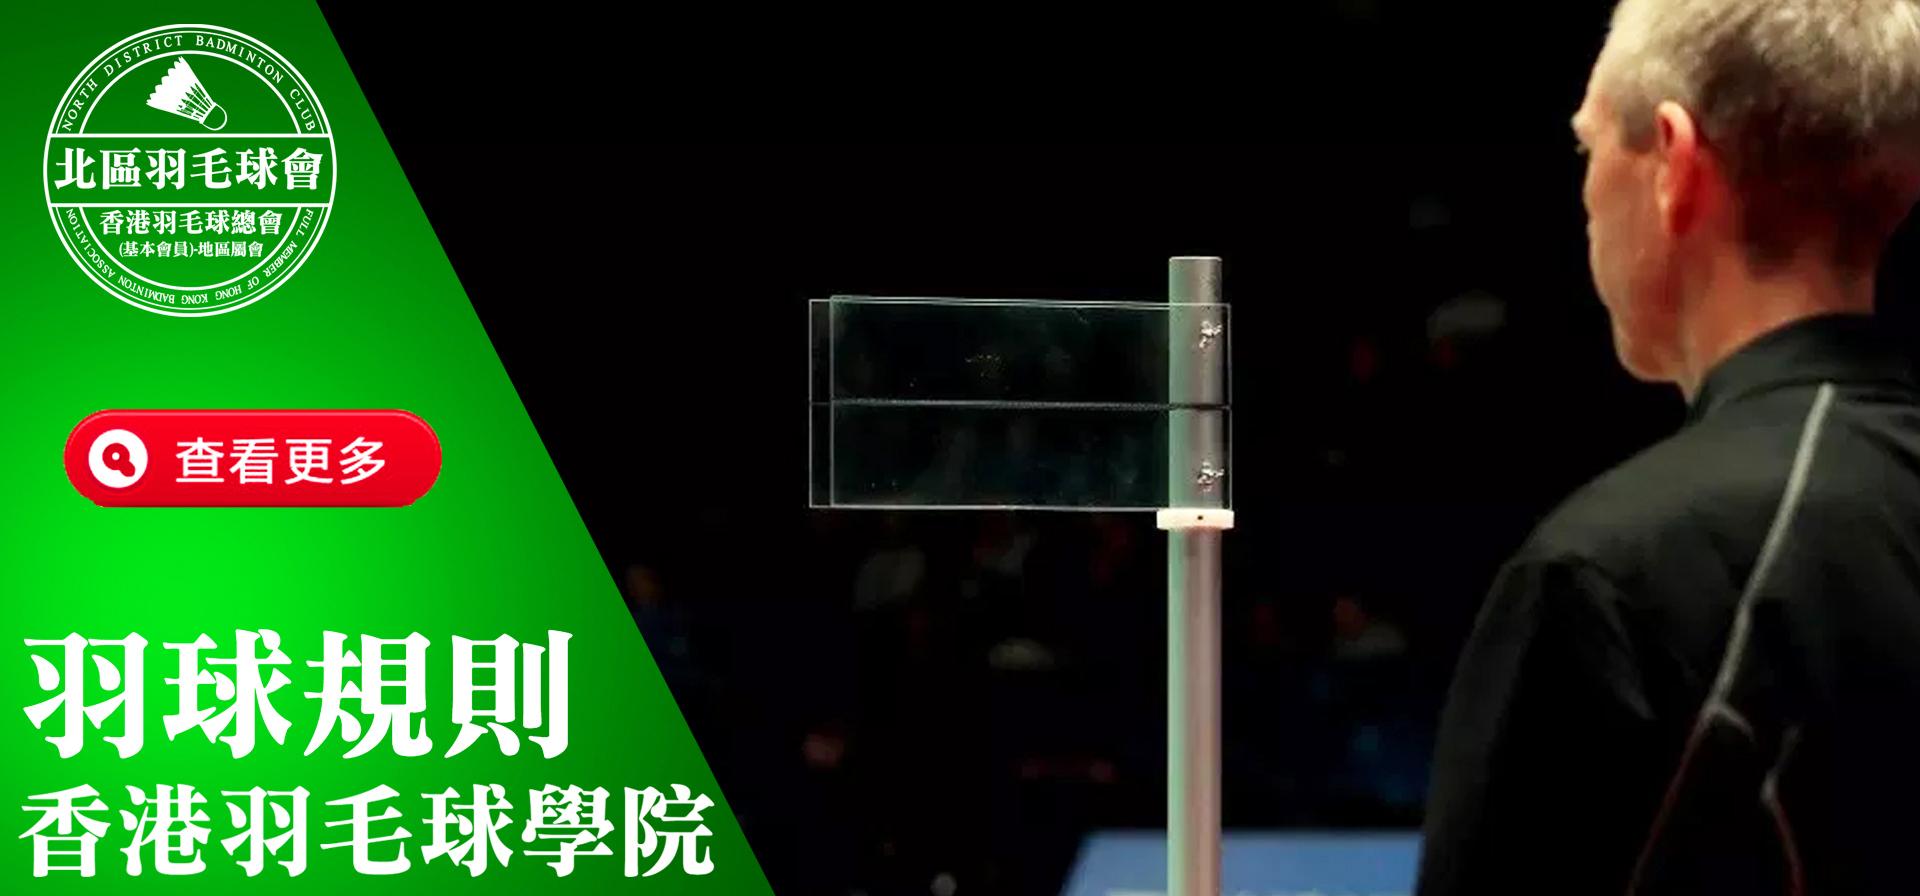 lawofbadminton,bwf,羽毛球犯規,羽毛球規則,hongkongbadmintonassociation,香港羽毛球總會,註冊羽毛球教練,北區羽毛球會,上水羽毛球,badmintoncoach